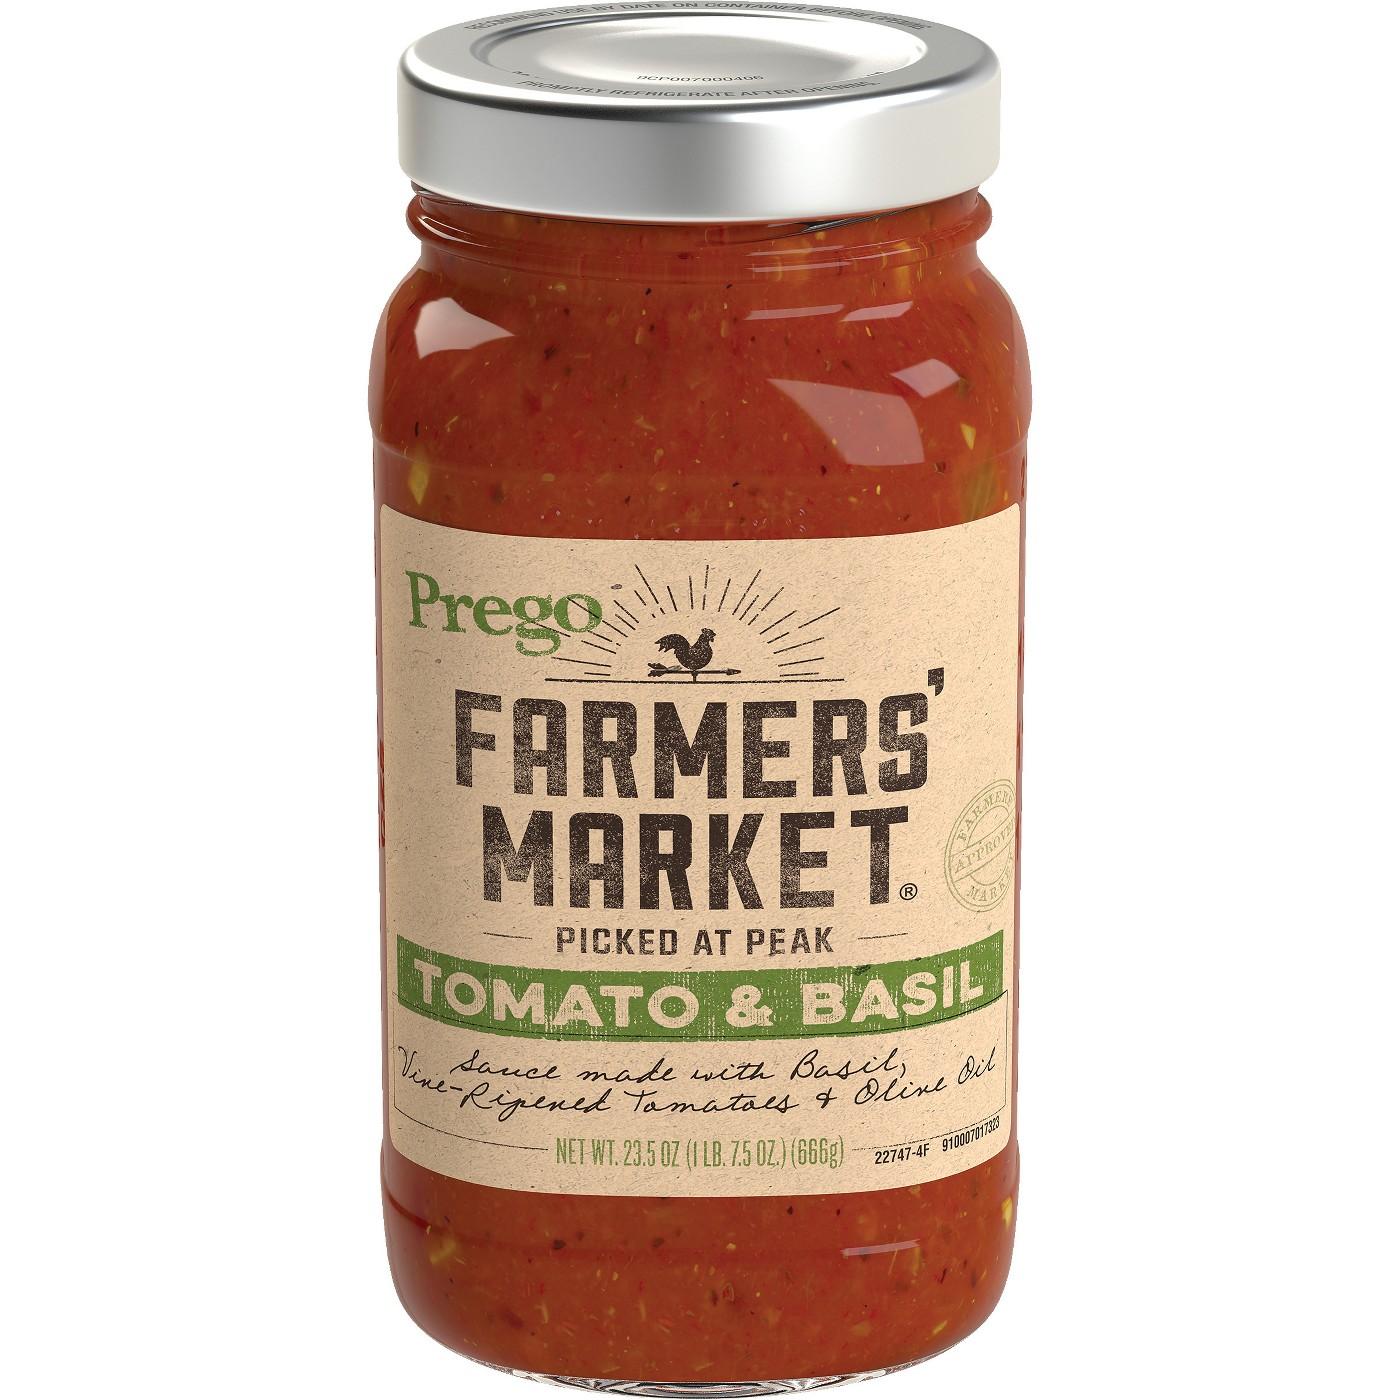 Prego® Farmers' Market Tomato & Basil Marinara Italian Sauce 23.5 oz - image 1 of 5